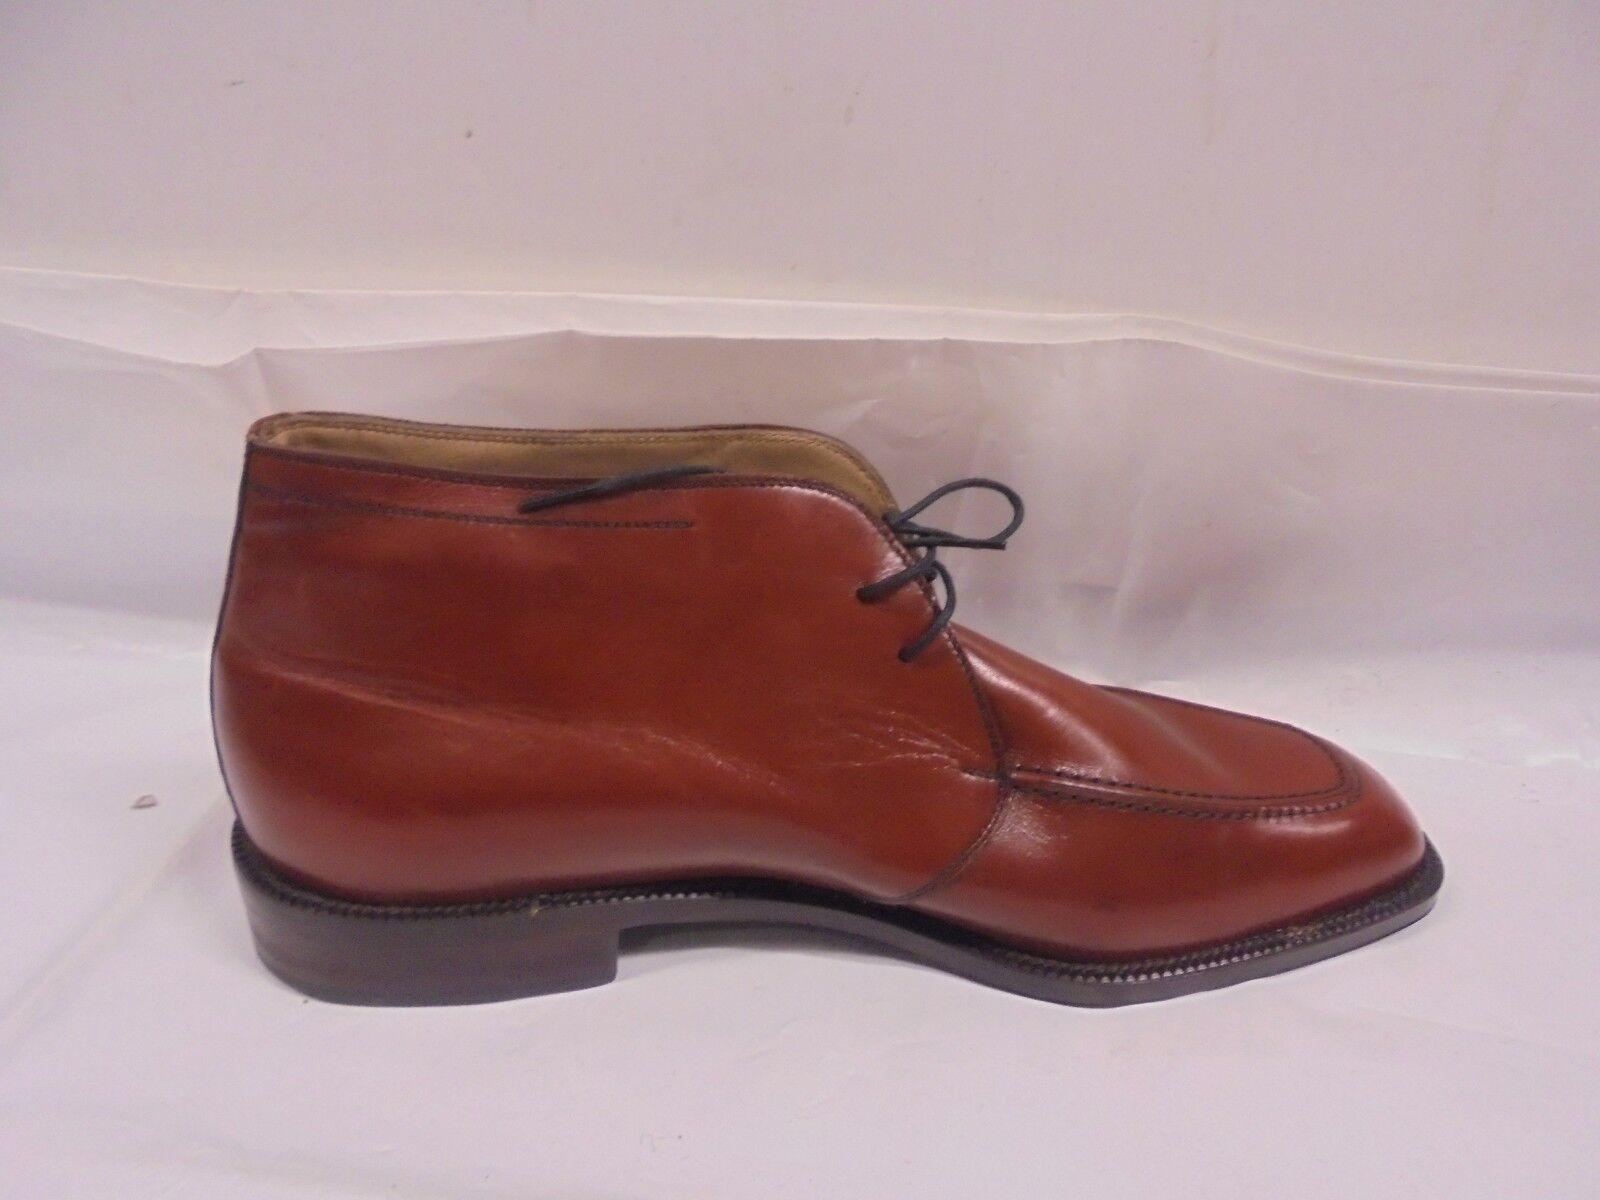 Herry Sax Herrenschuhe Herrenschuhe Herrenschuhe braunem Leder antiqued Made in  Handwerk kostbare 873cd7